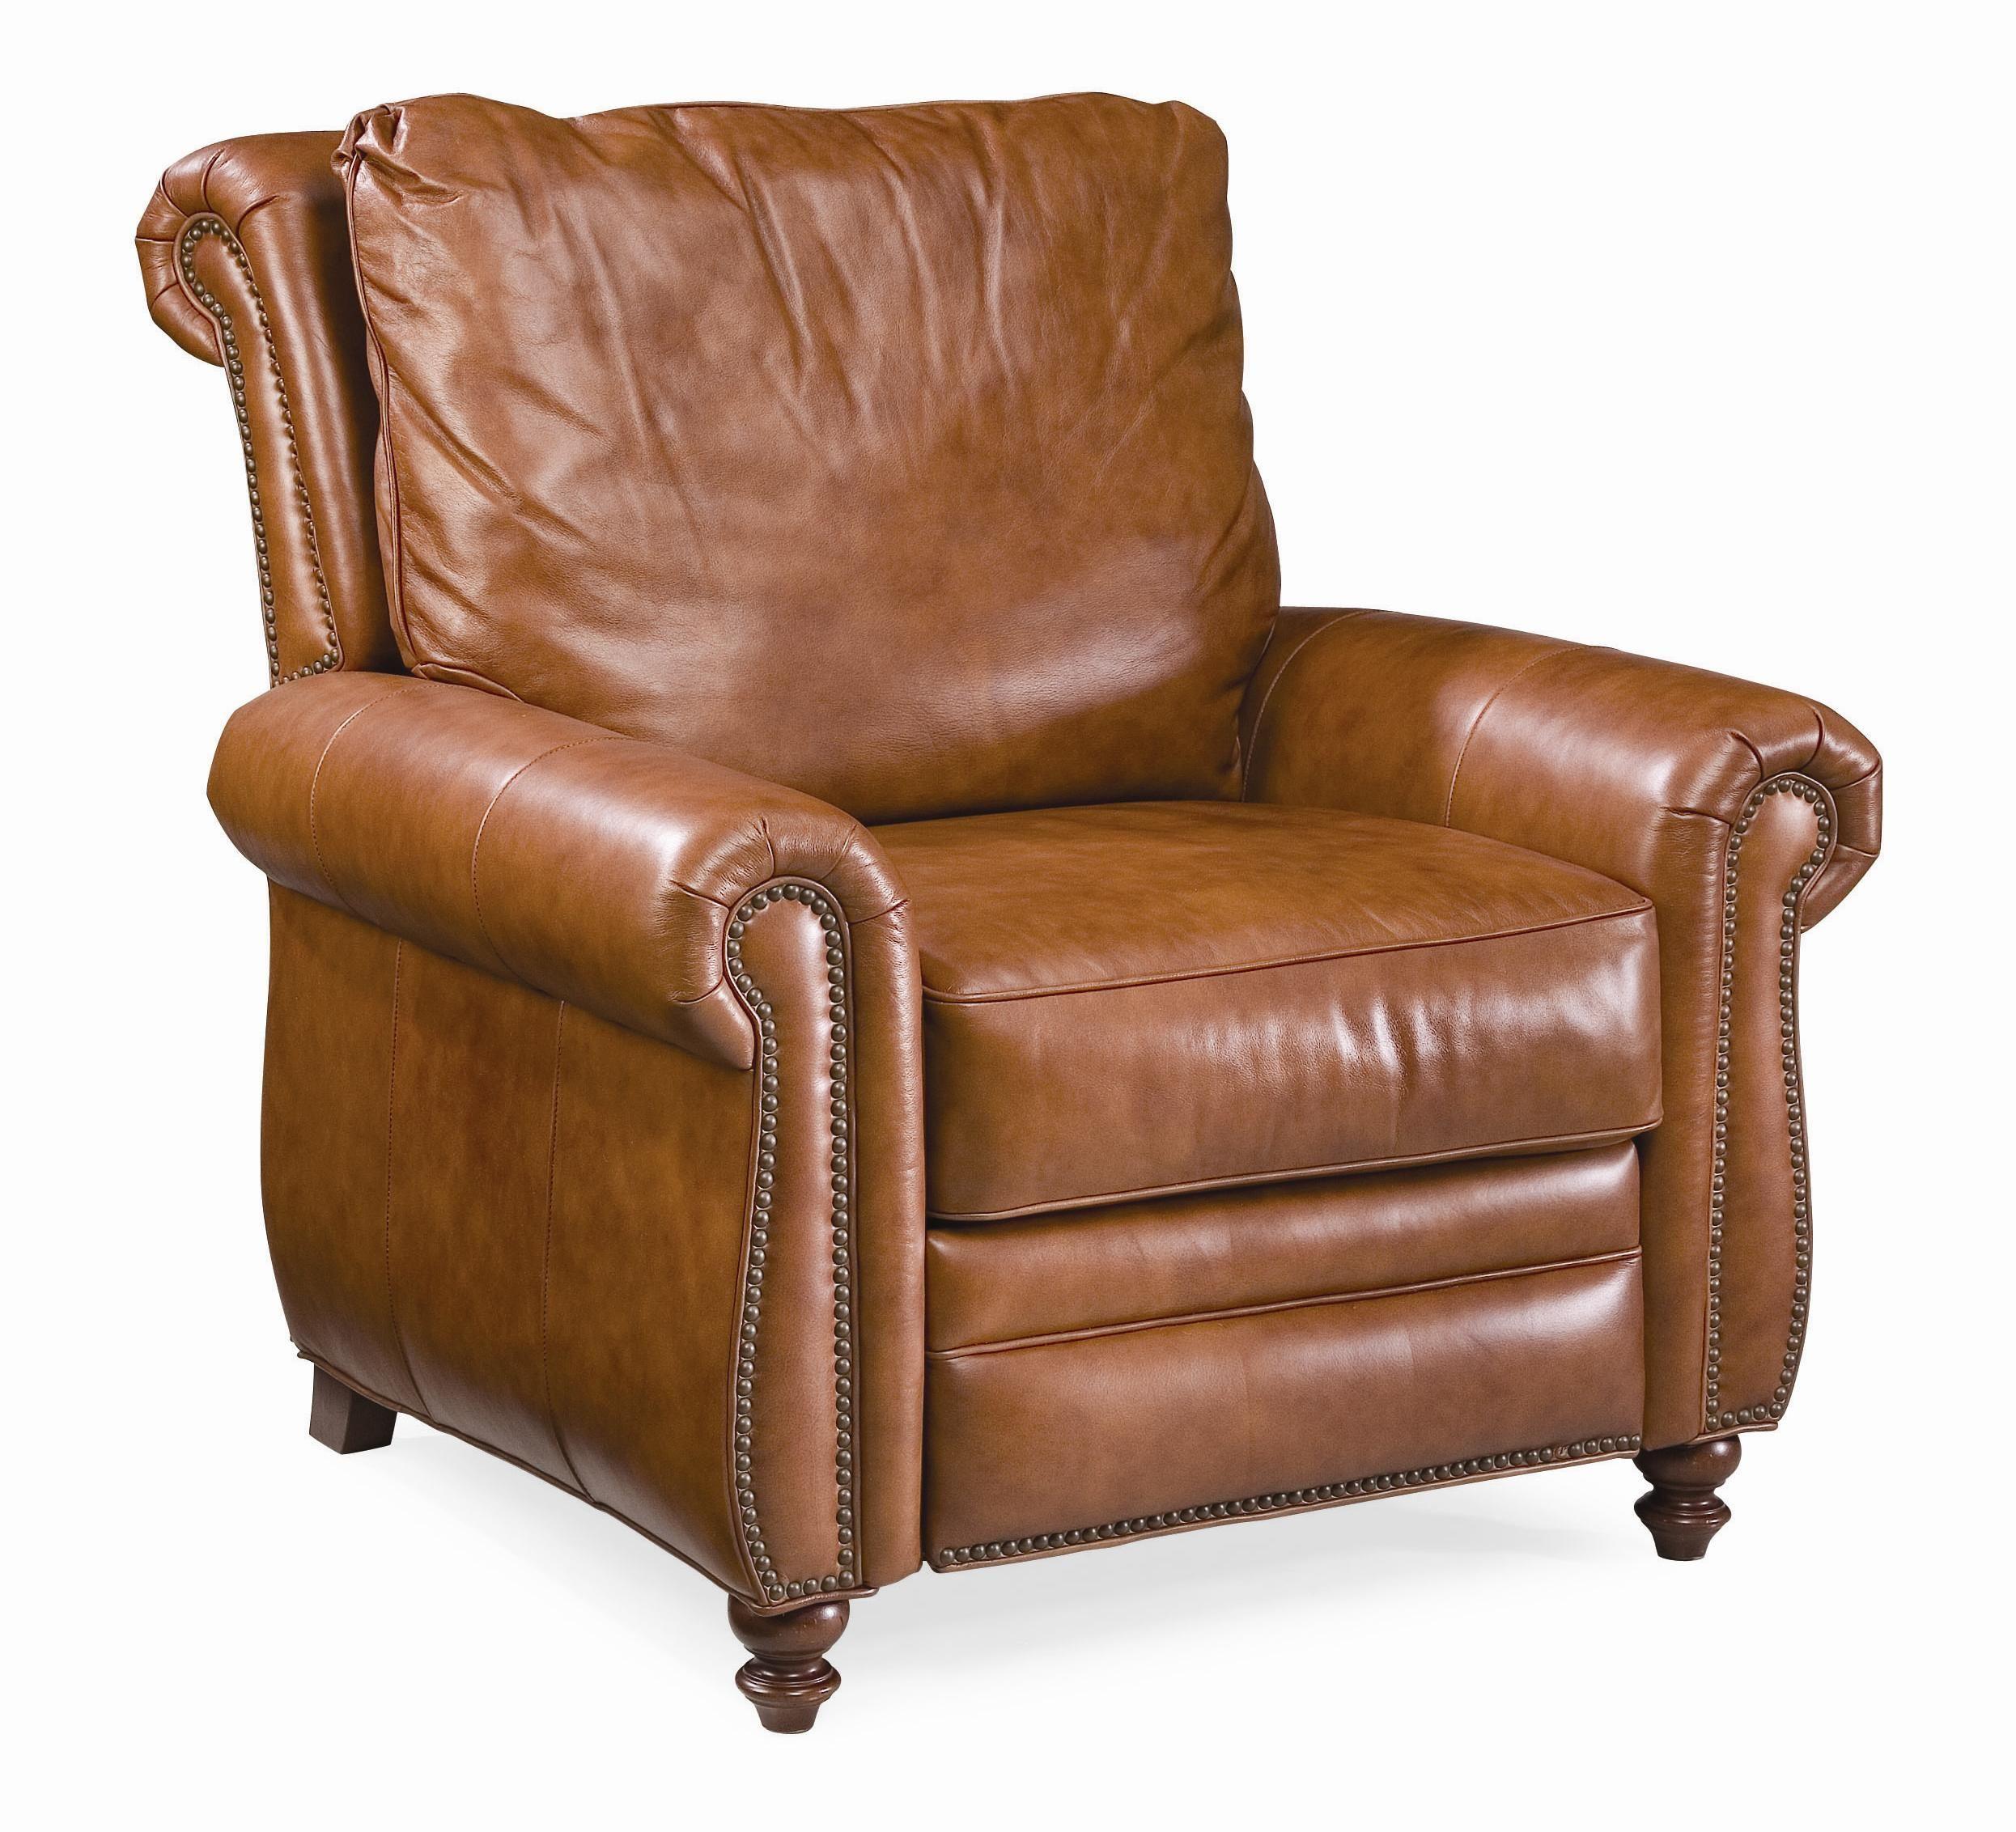 thomasville reclining sofa loveseat beds 77 sofas baci living room